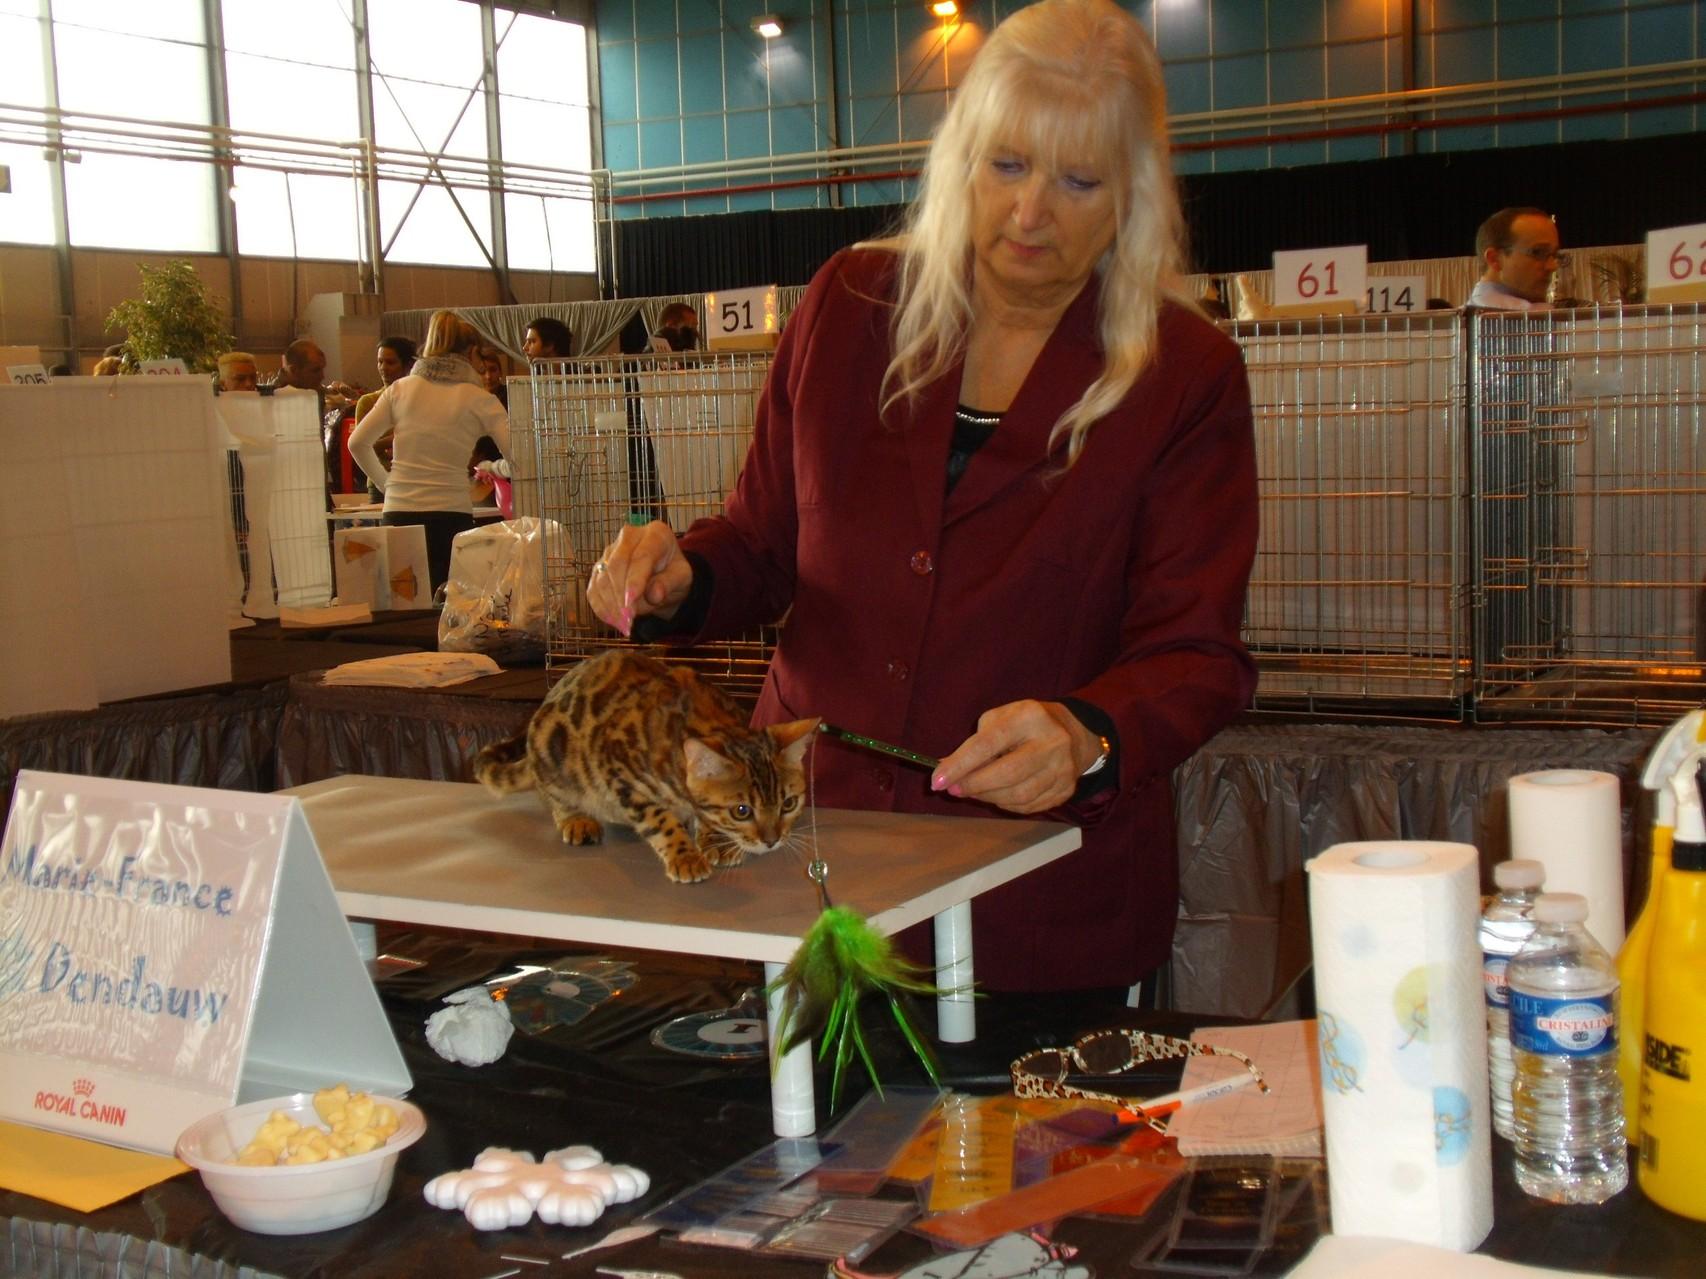 Exposicion felina Toulouse con Marie France Dendauw (juez AB) - 08-02-2014